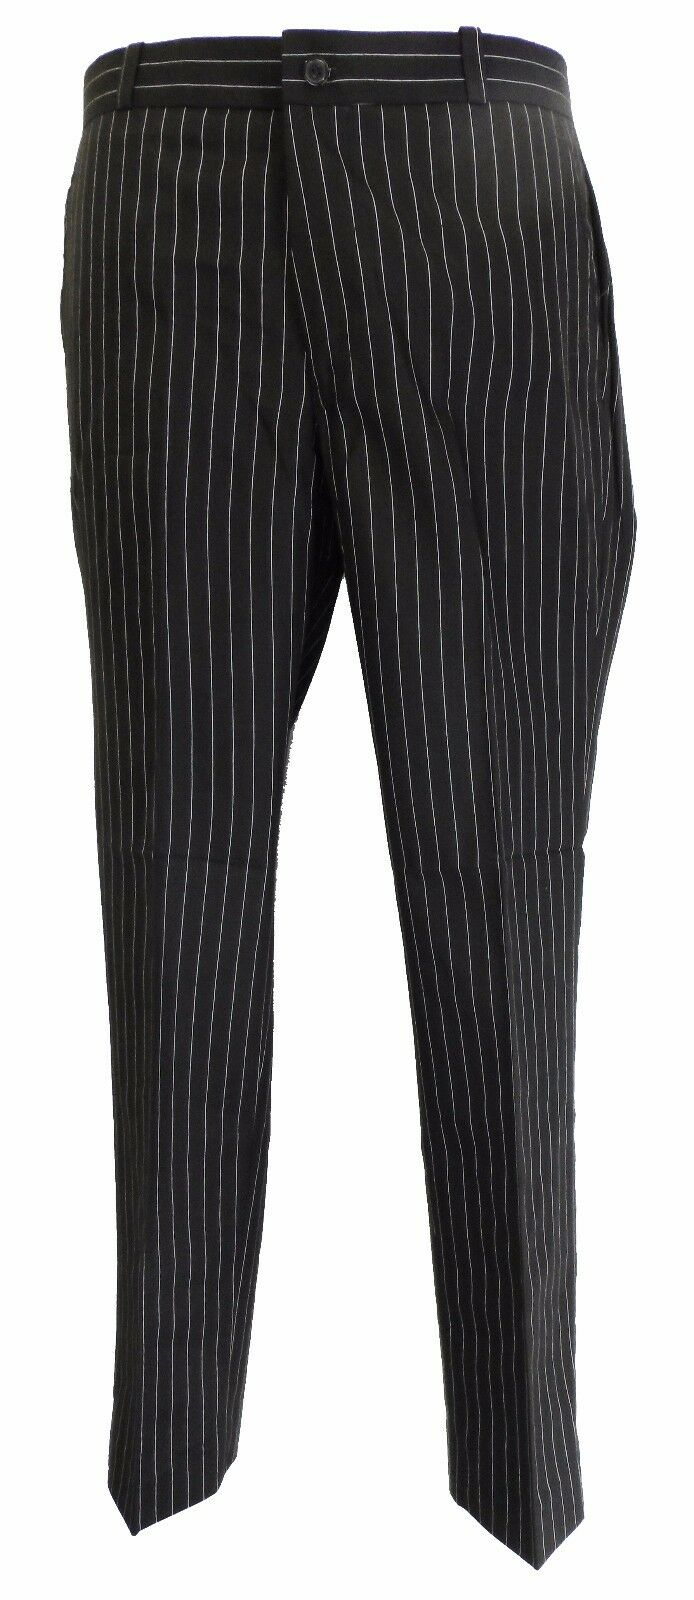 Gessato Nero 60s 70s Modello Retrò Vintage Sta Stampa Pantaloni